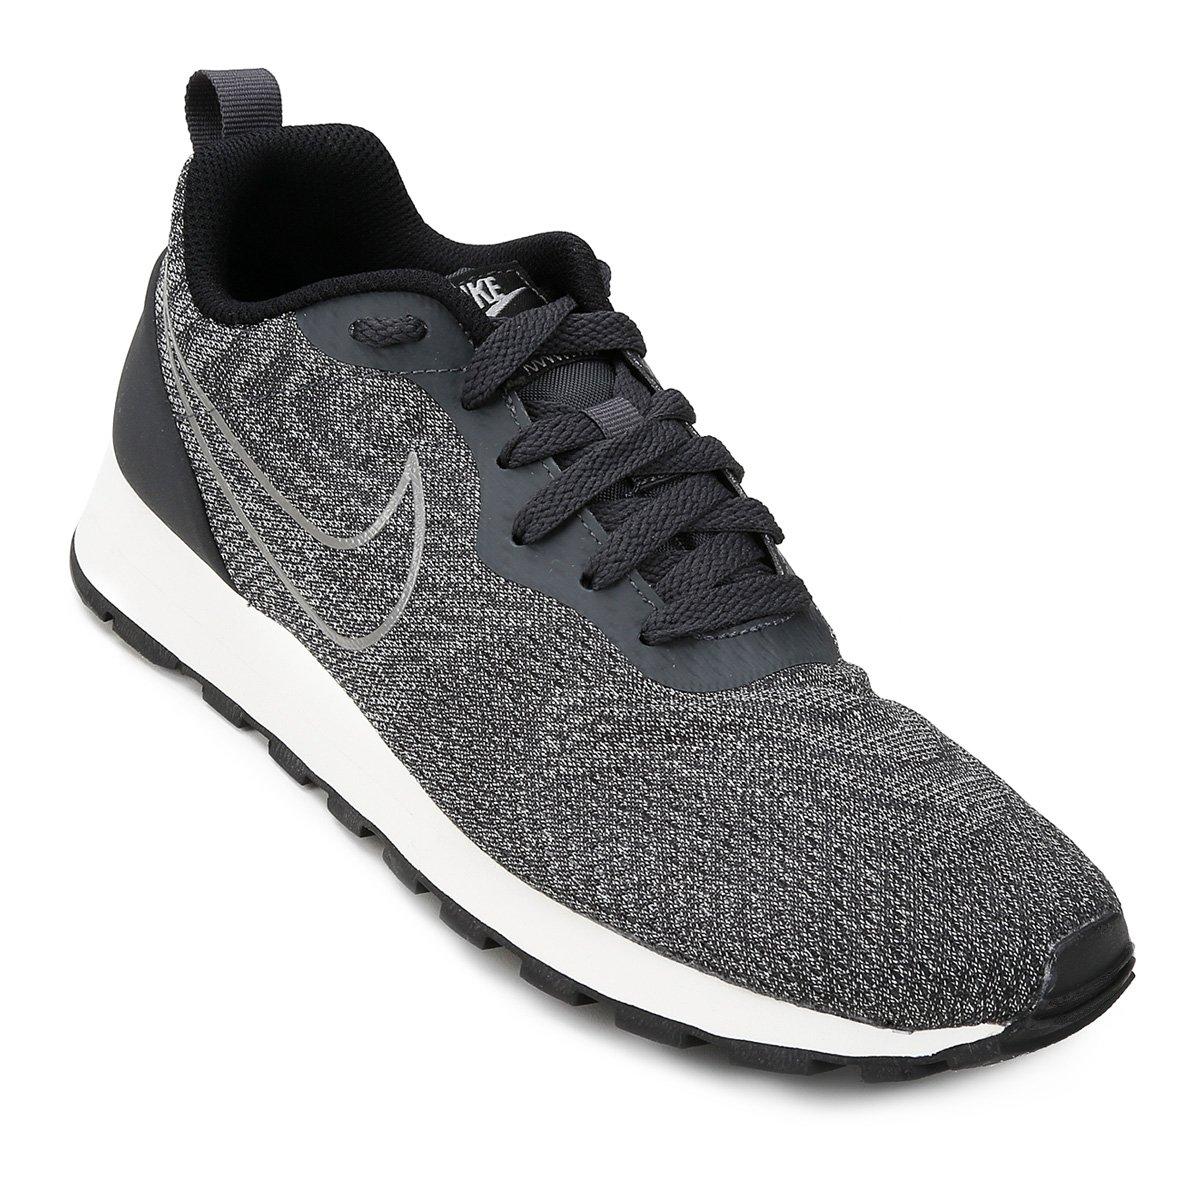 1768faa774798 Tênis Nike Md Runner 2 Eng Mesh Feminino - Chumbo e Preto - Compre Agora